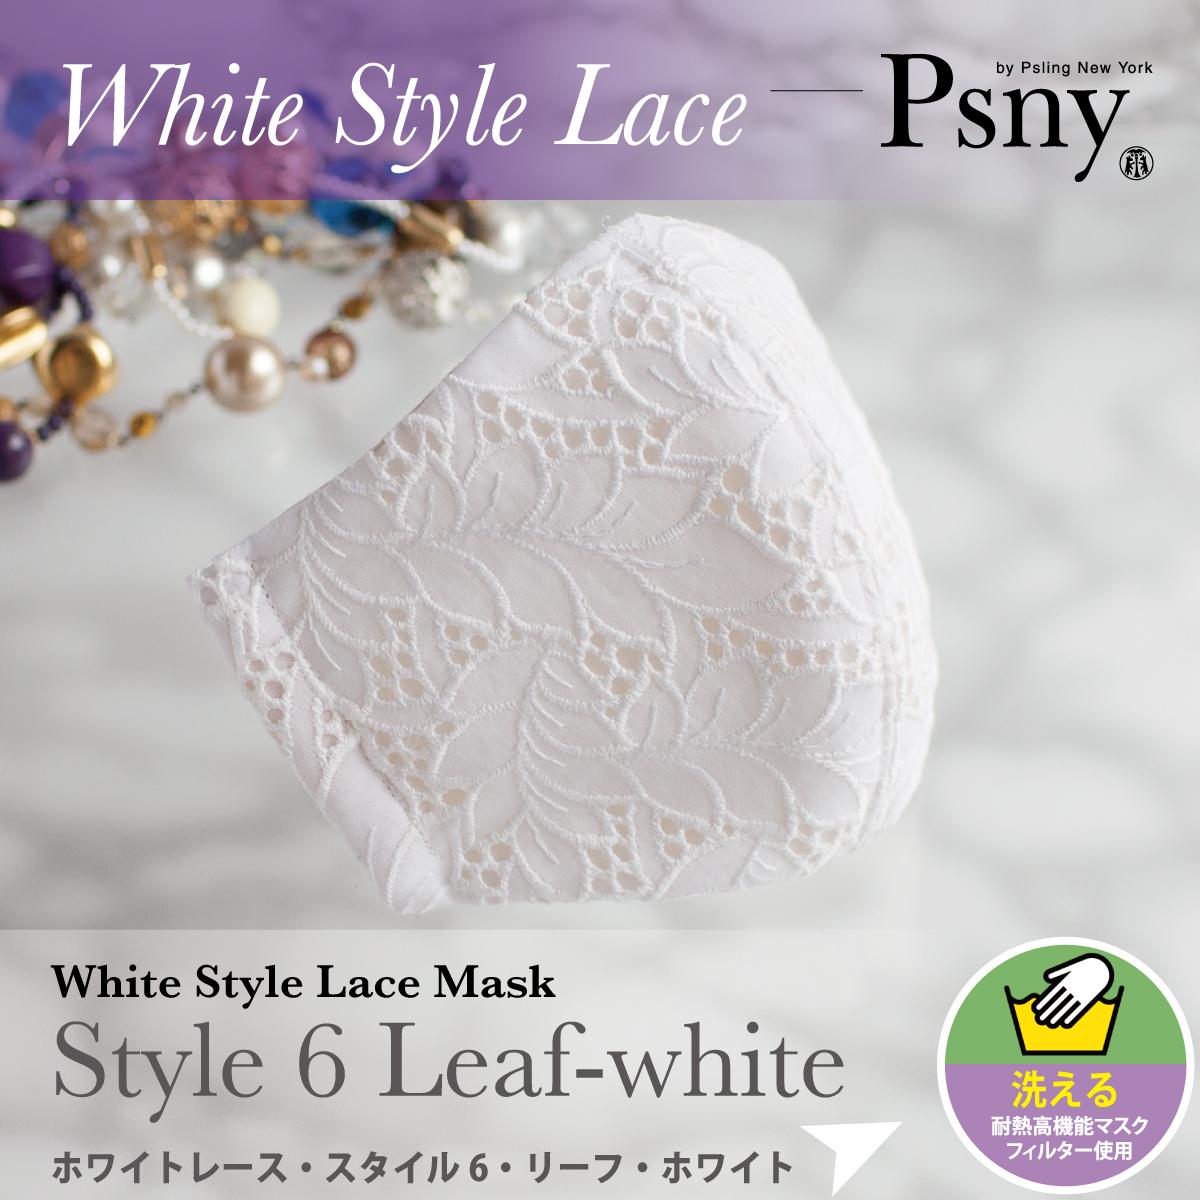 PSNY レース ホワイト スタイル リーフ ホワイト 花粉 不織布フィルター入り 立体 大人用 美しい 高級 セレブ マスク 送料無料 L39